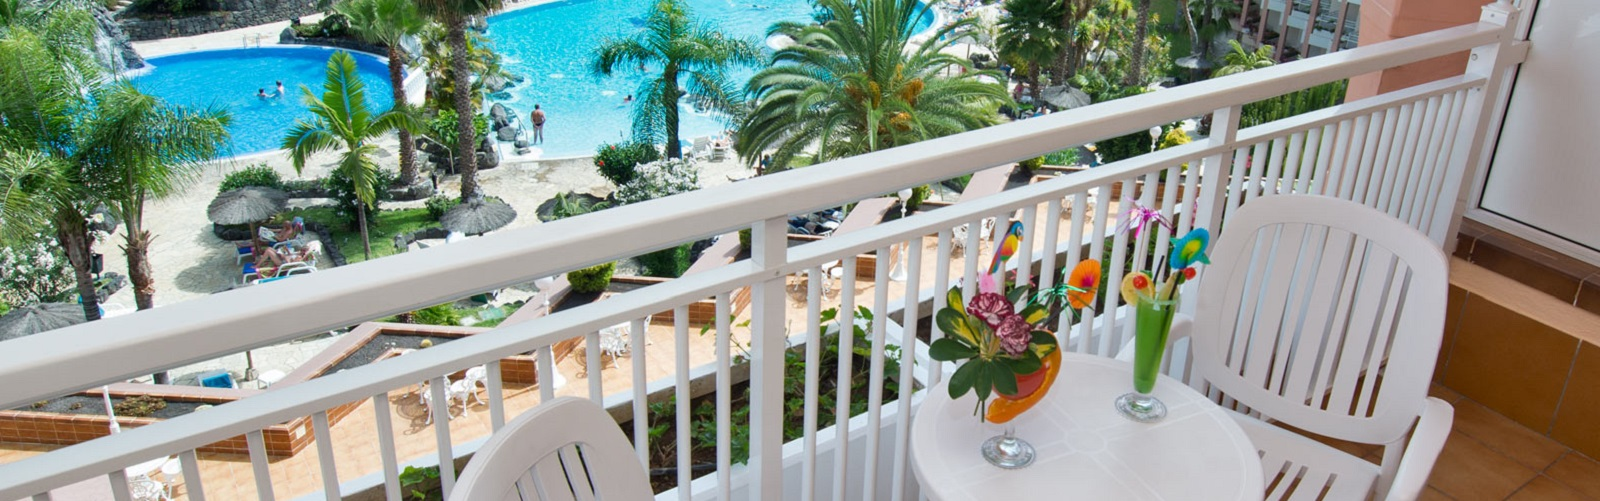 Hotel Puerto Palace2